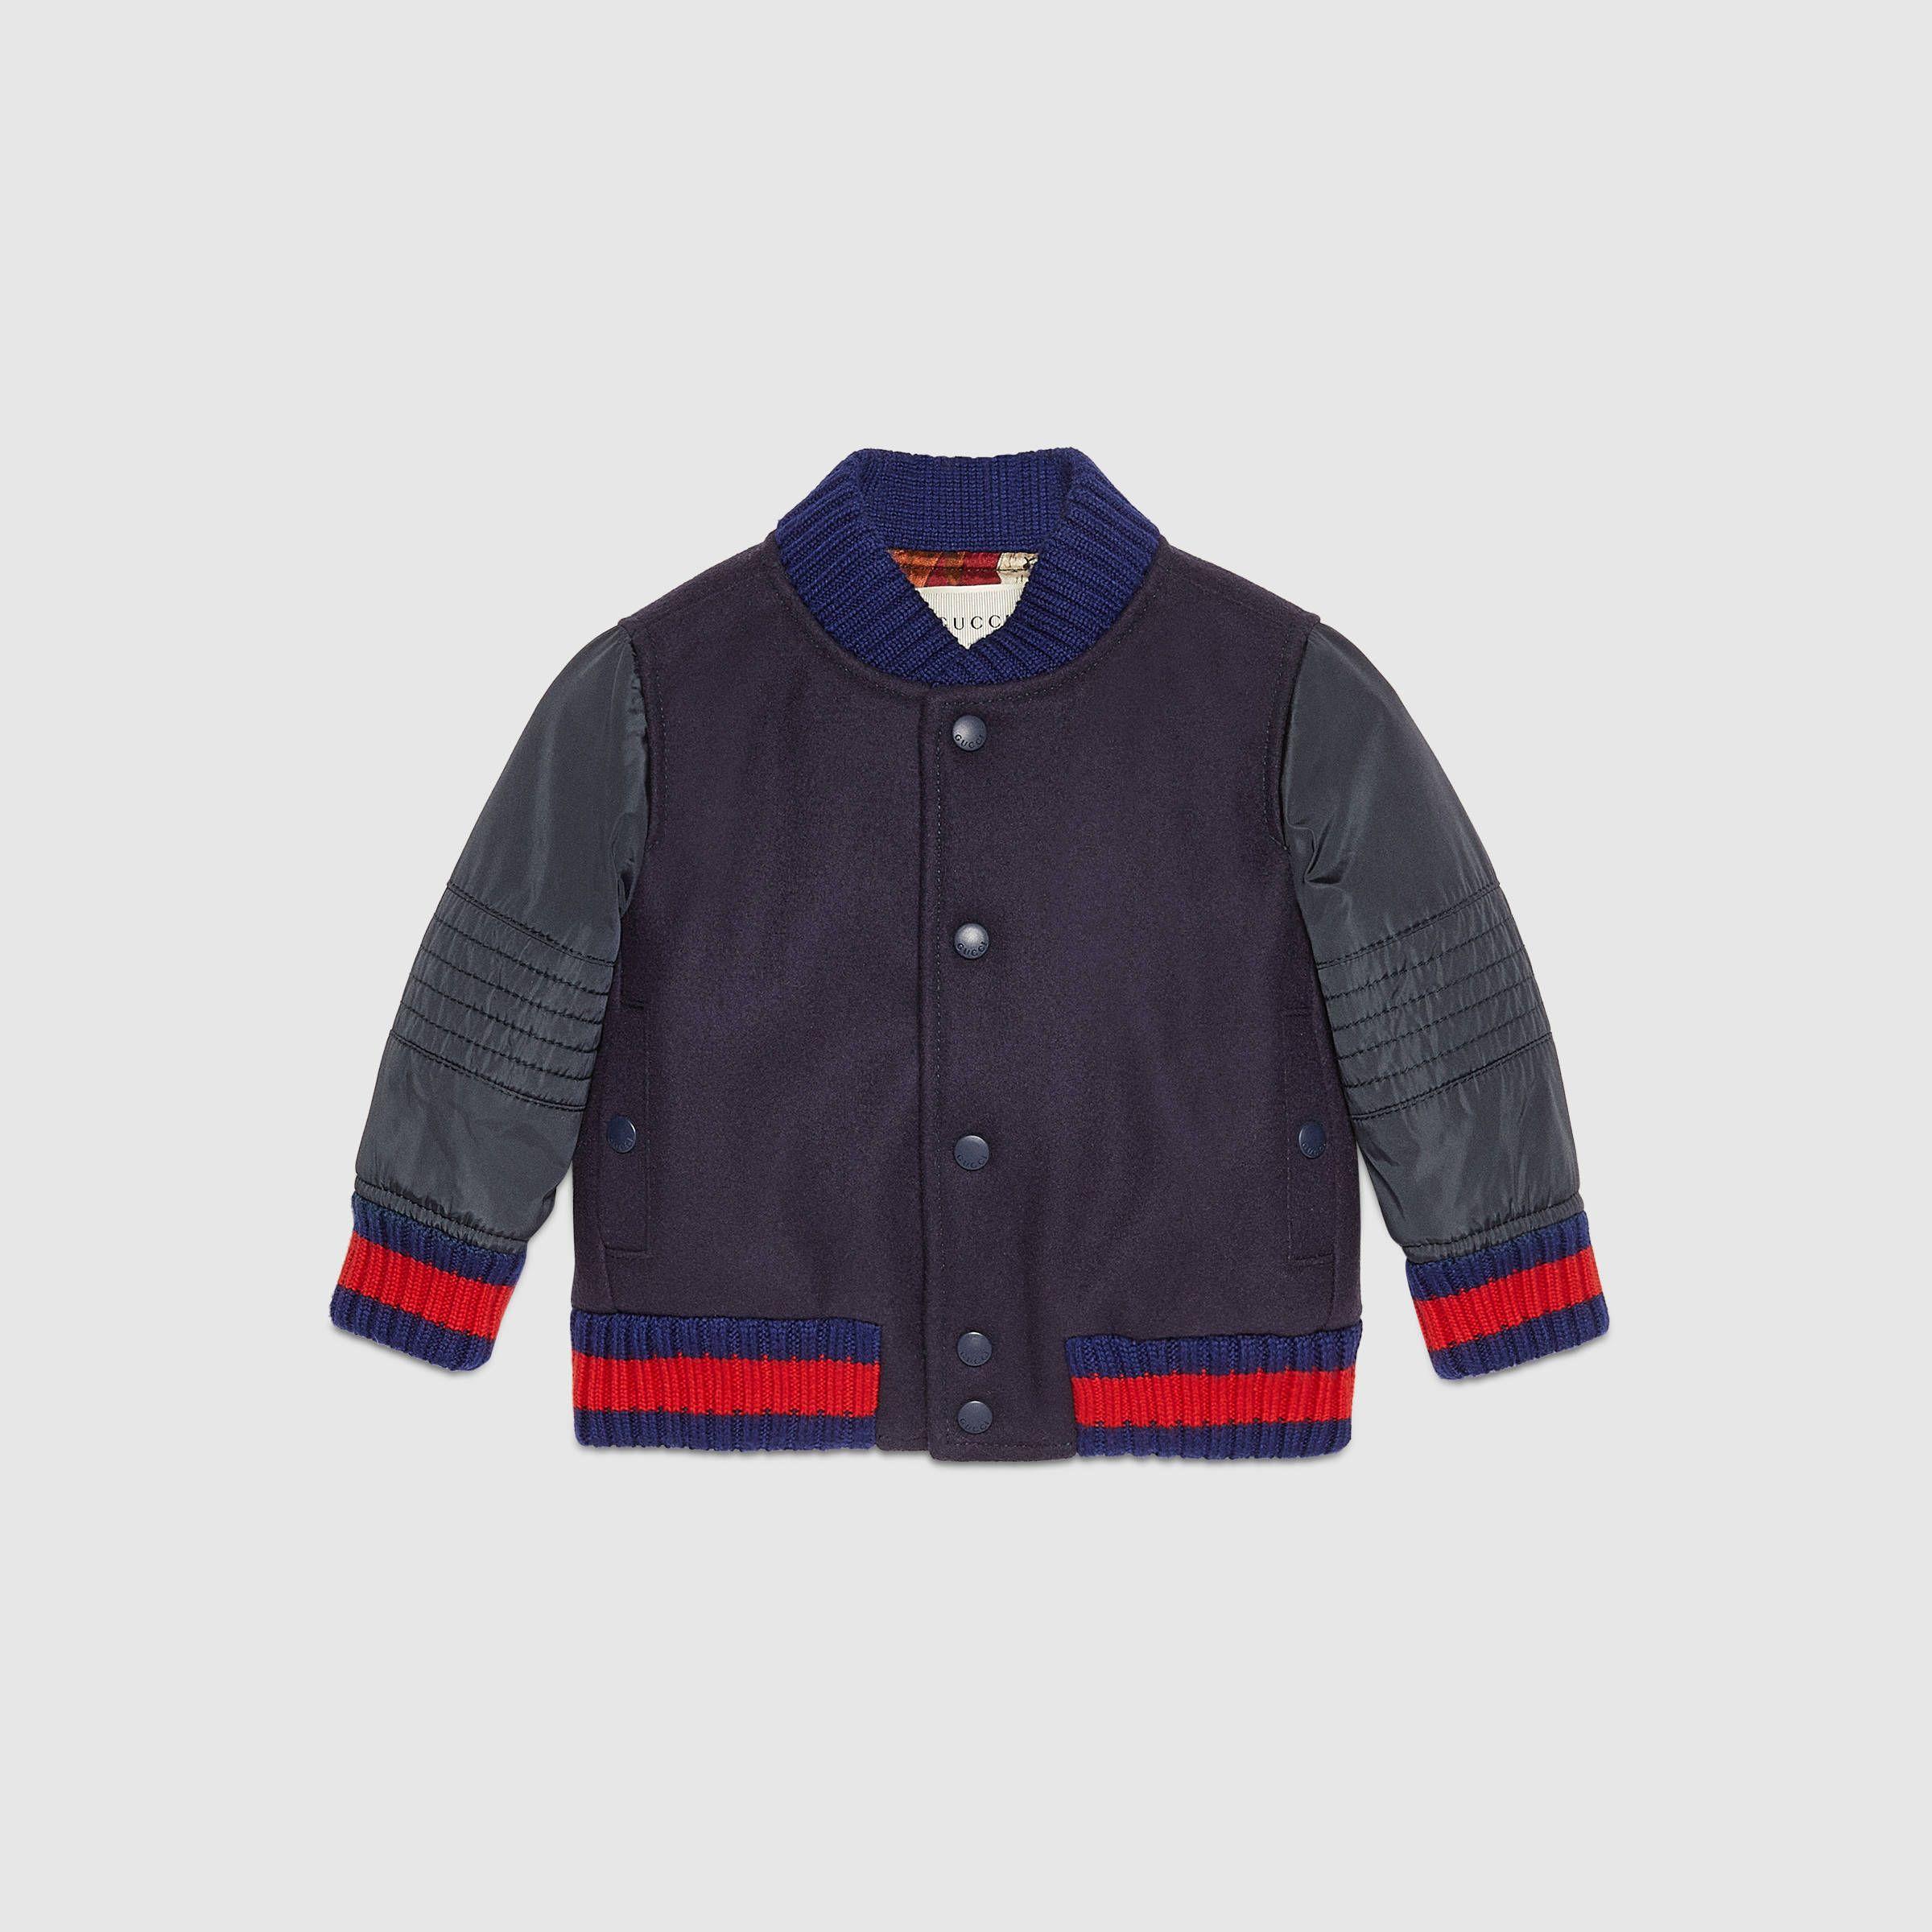 972021bd26be Baby wool and nylon bomber jacket - Gucci Boy s Jackets   Blazer  430265XB0134058